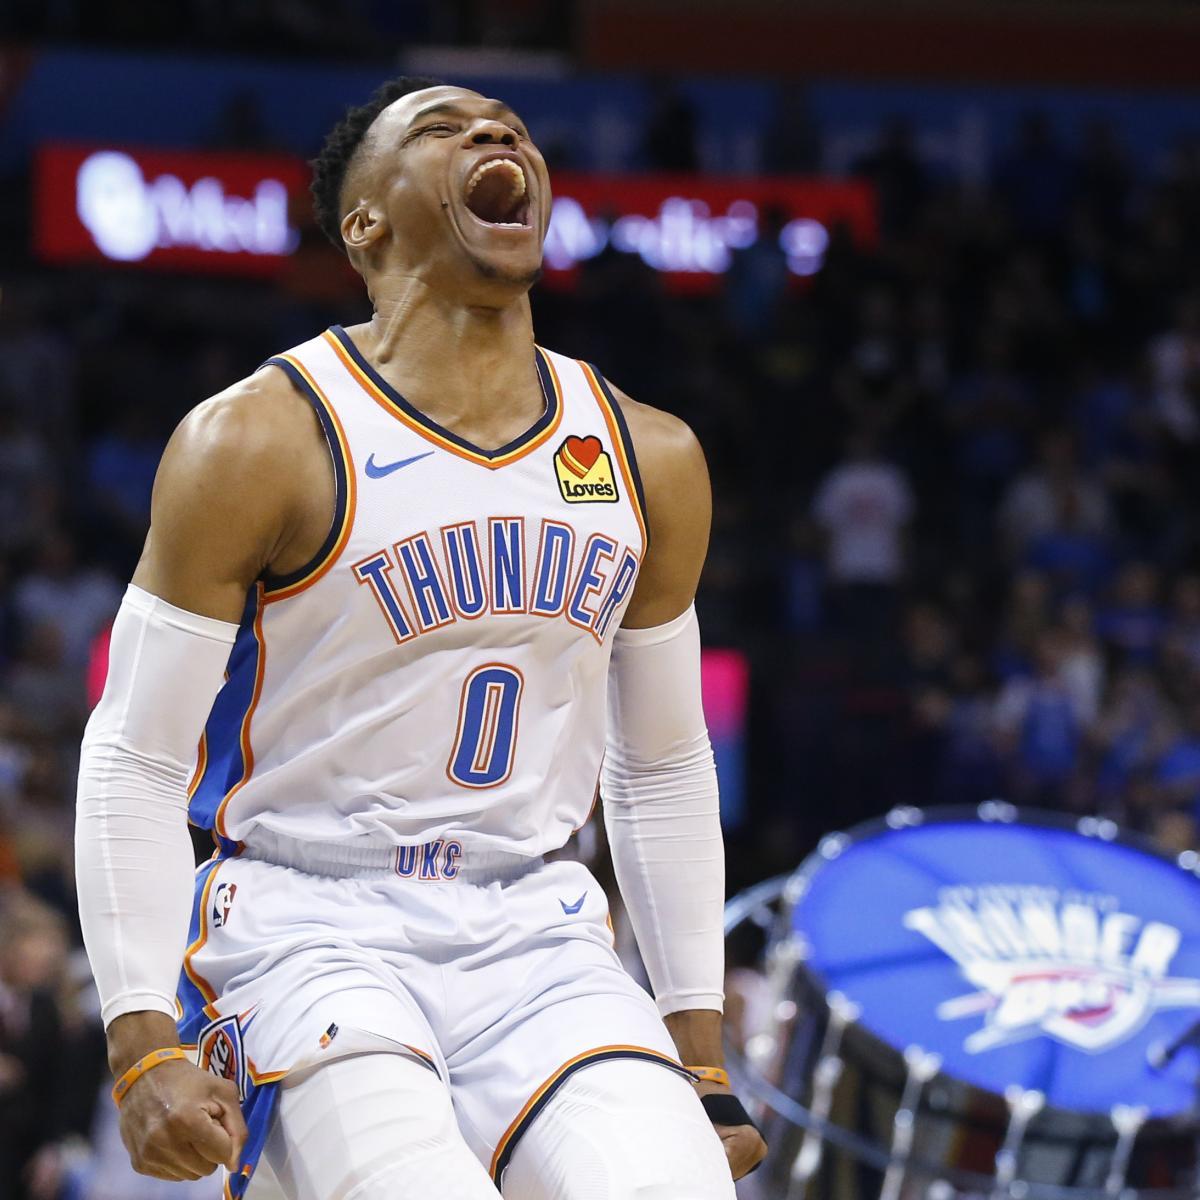 NBA Playoff Bracket 2019: Full Review Of Postseason